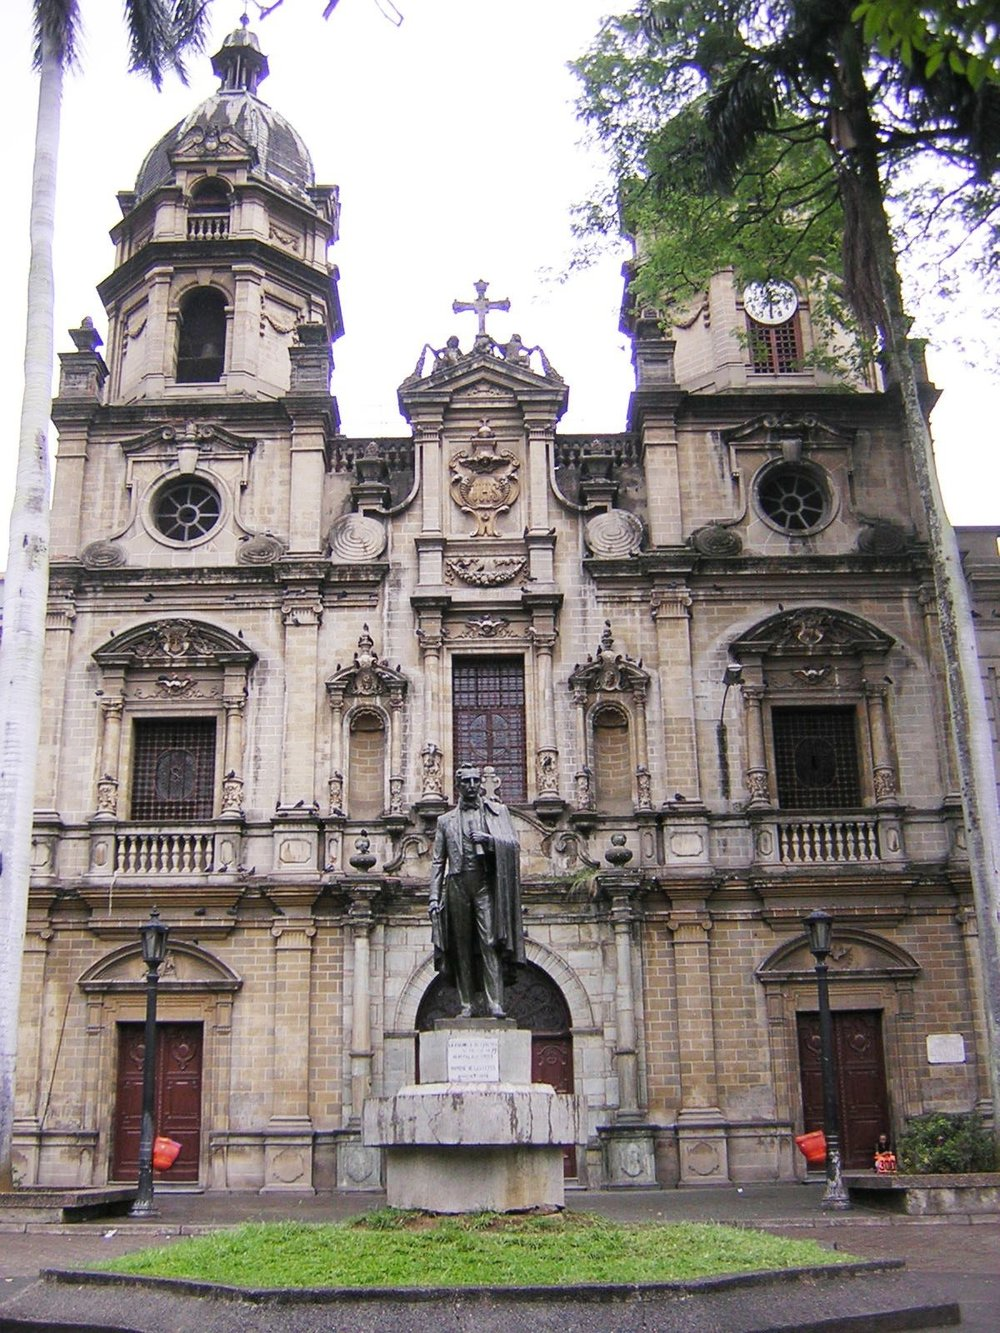 Iglesia_de_San_Ignacio-Fachada-Medellin.JPG